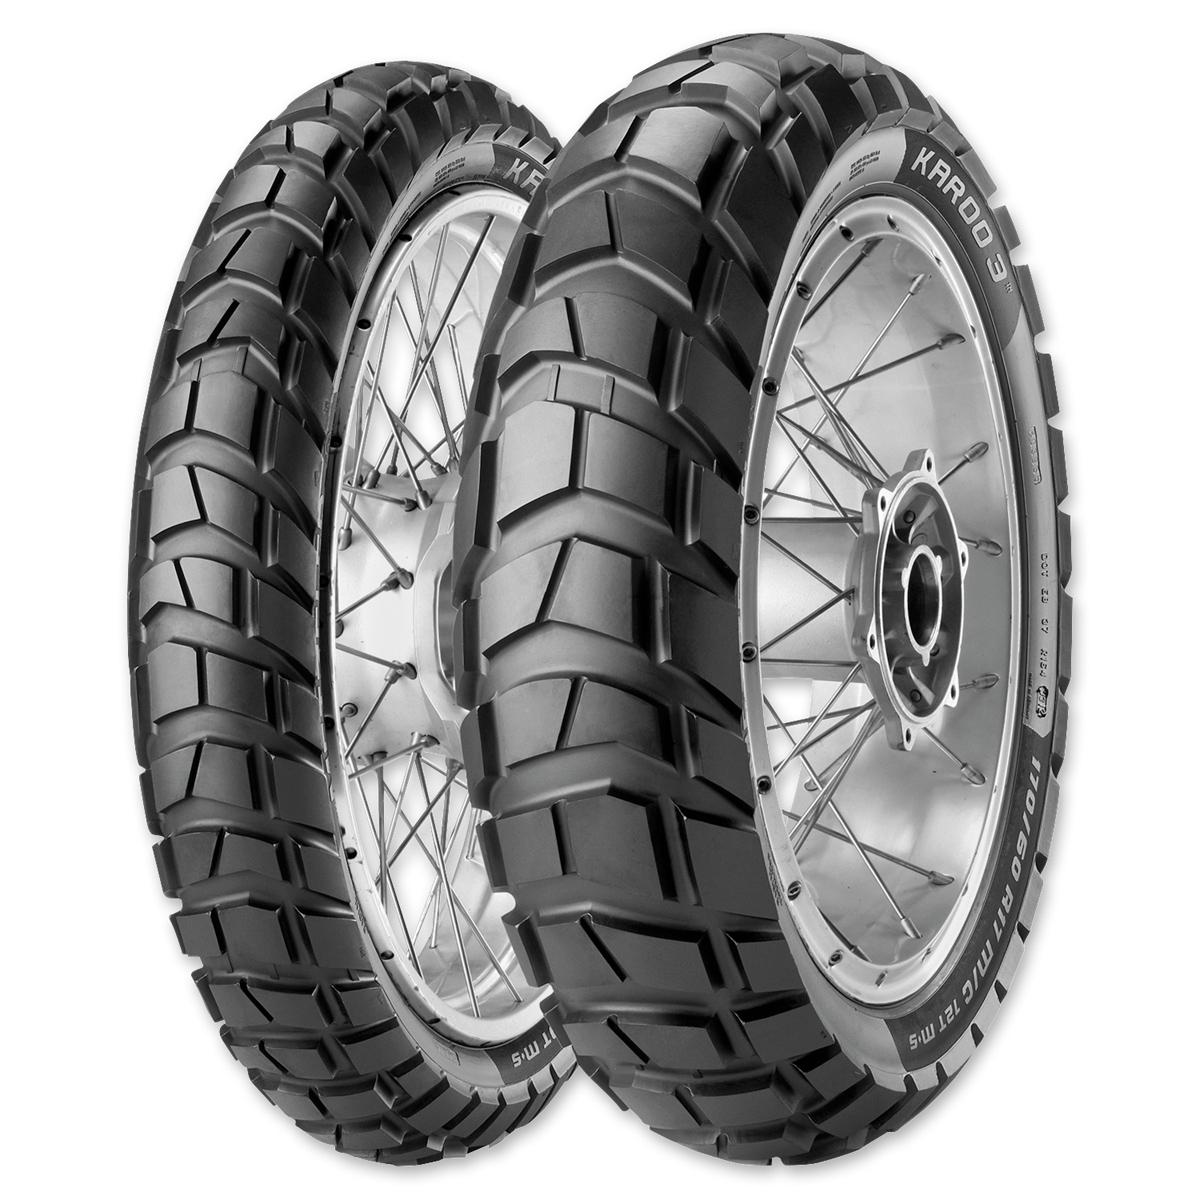 Metzeler Karoo 3 150/70-17 Rear Tire